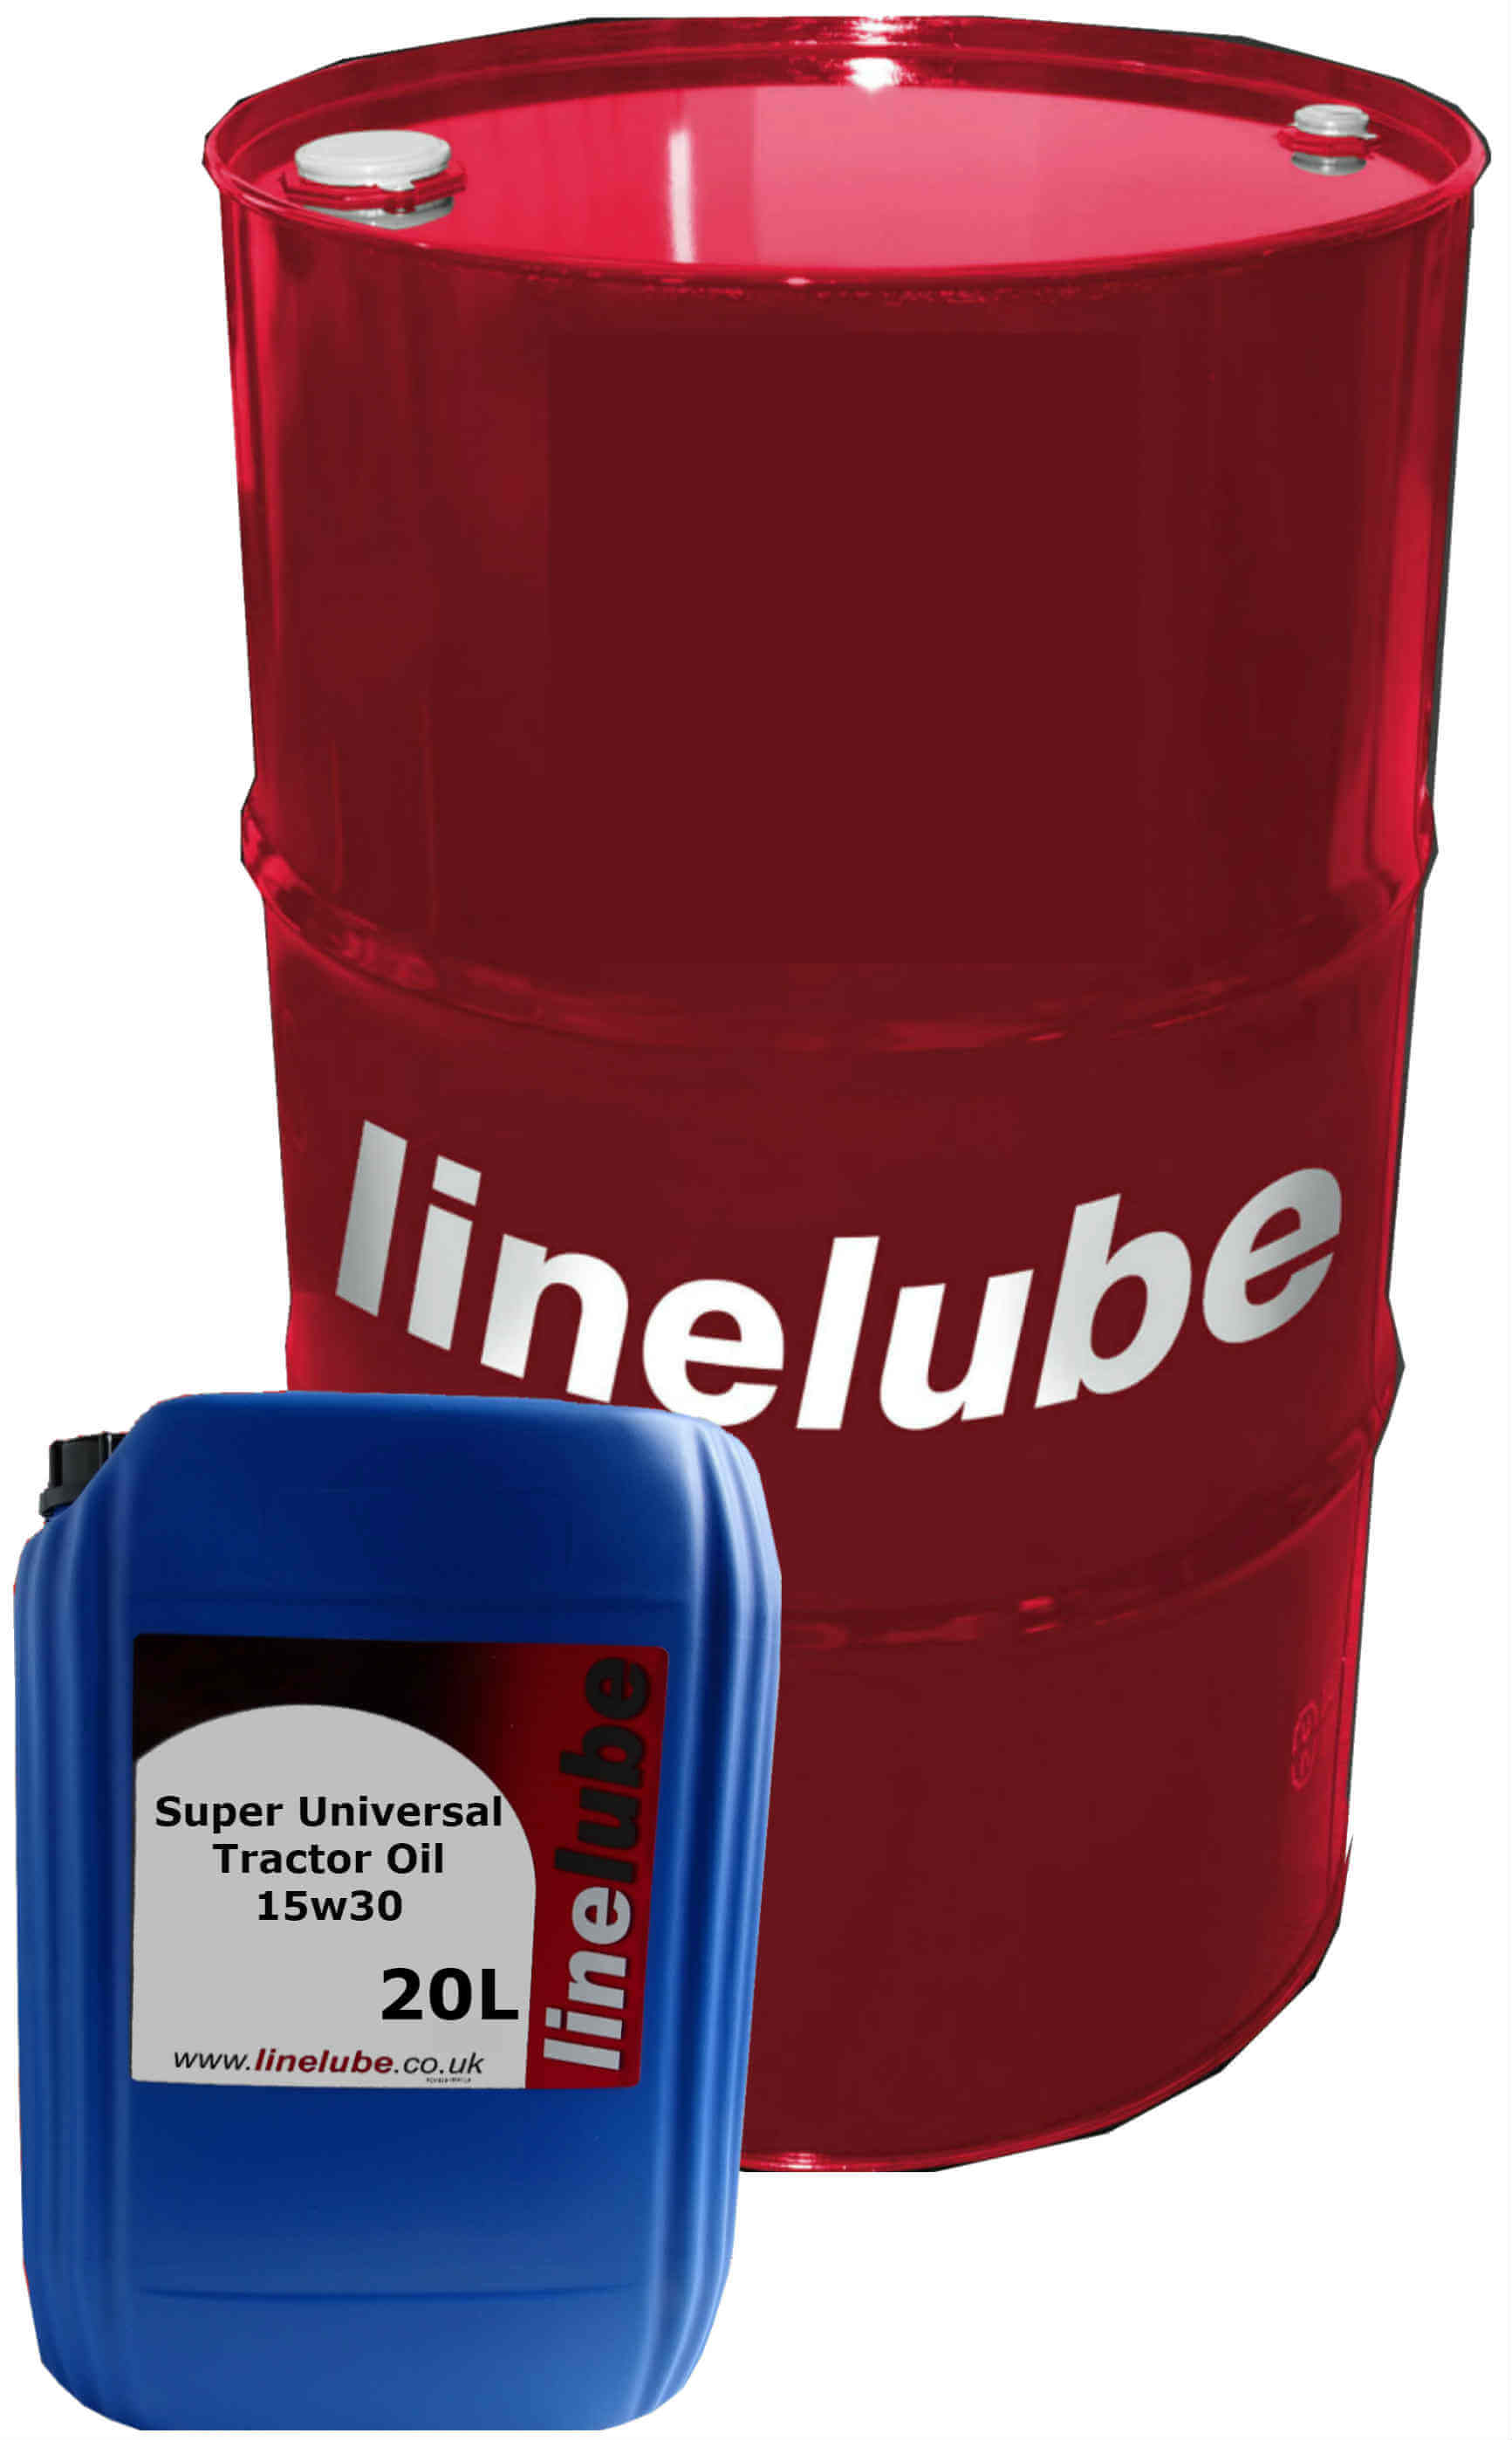 linelube Super Universal Tractor Oil 15W-30